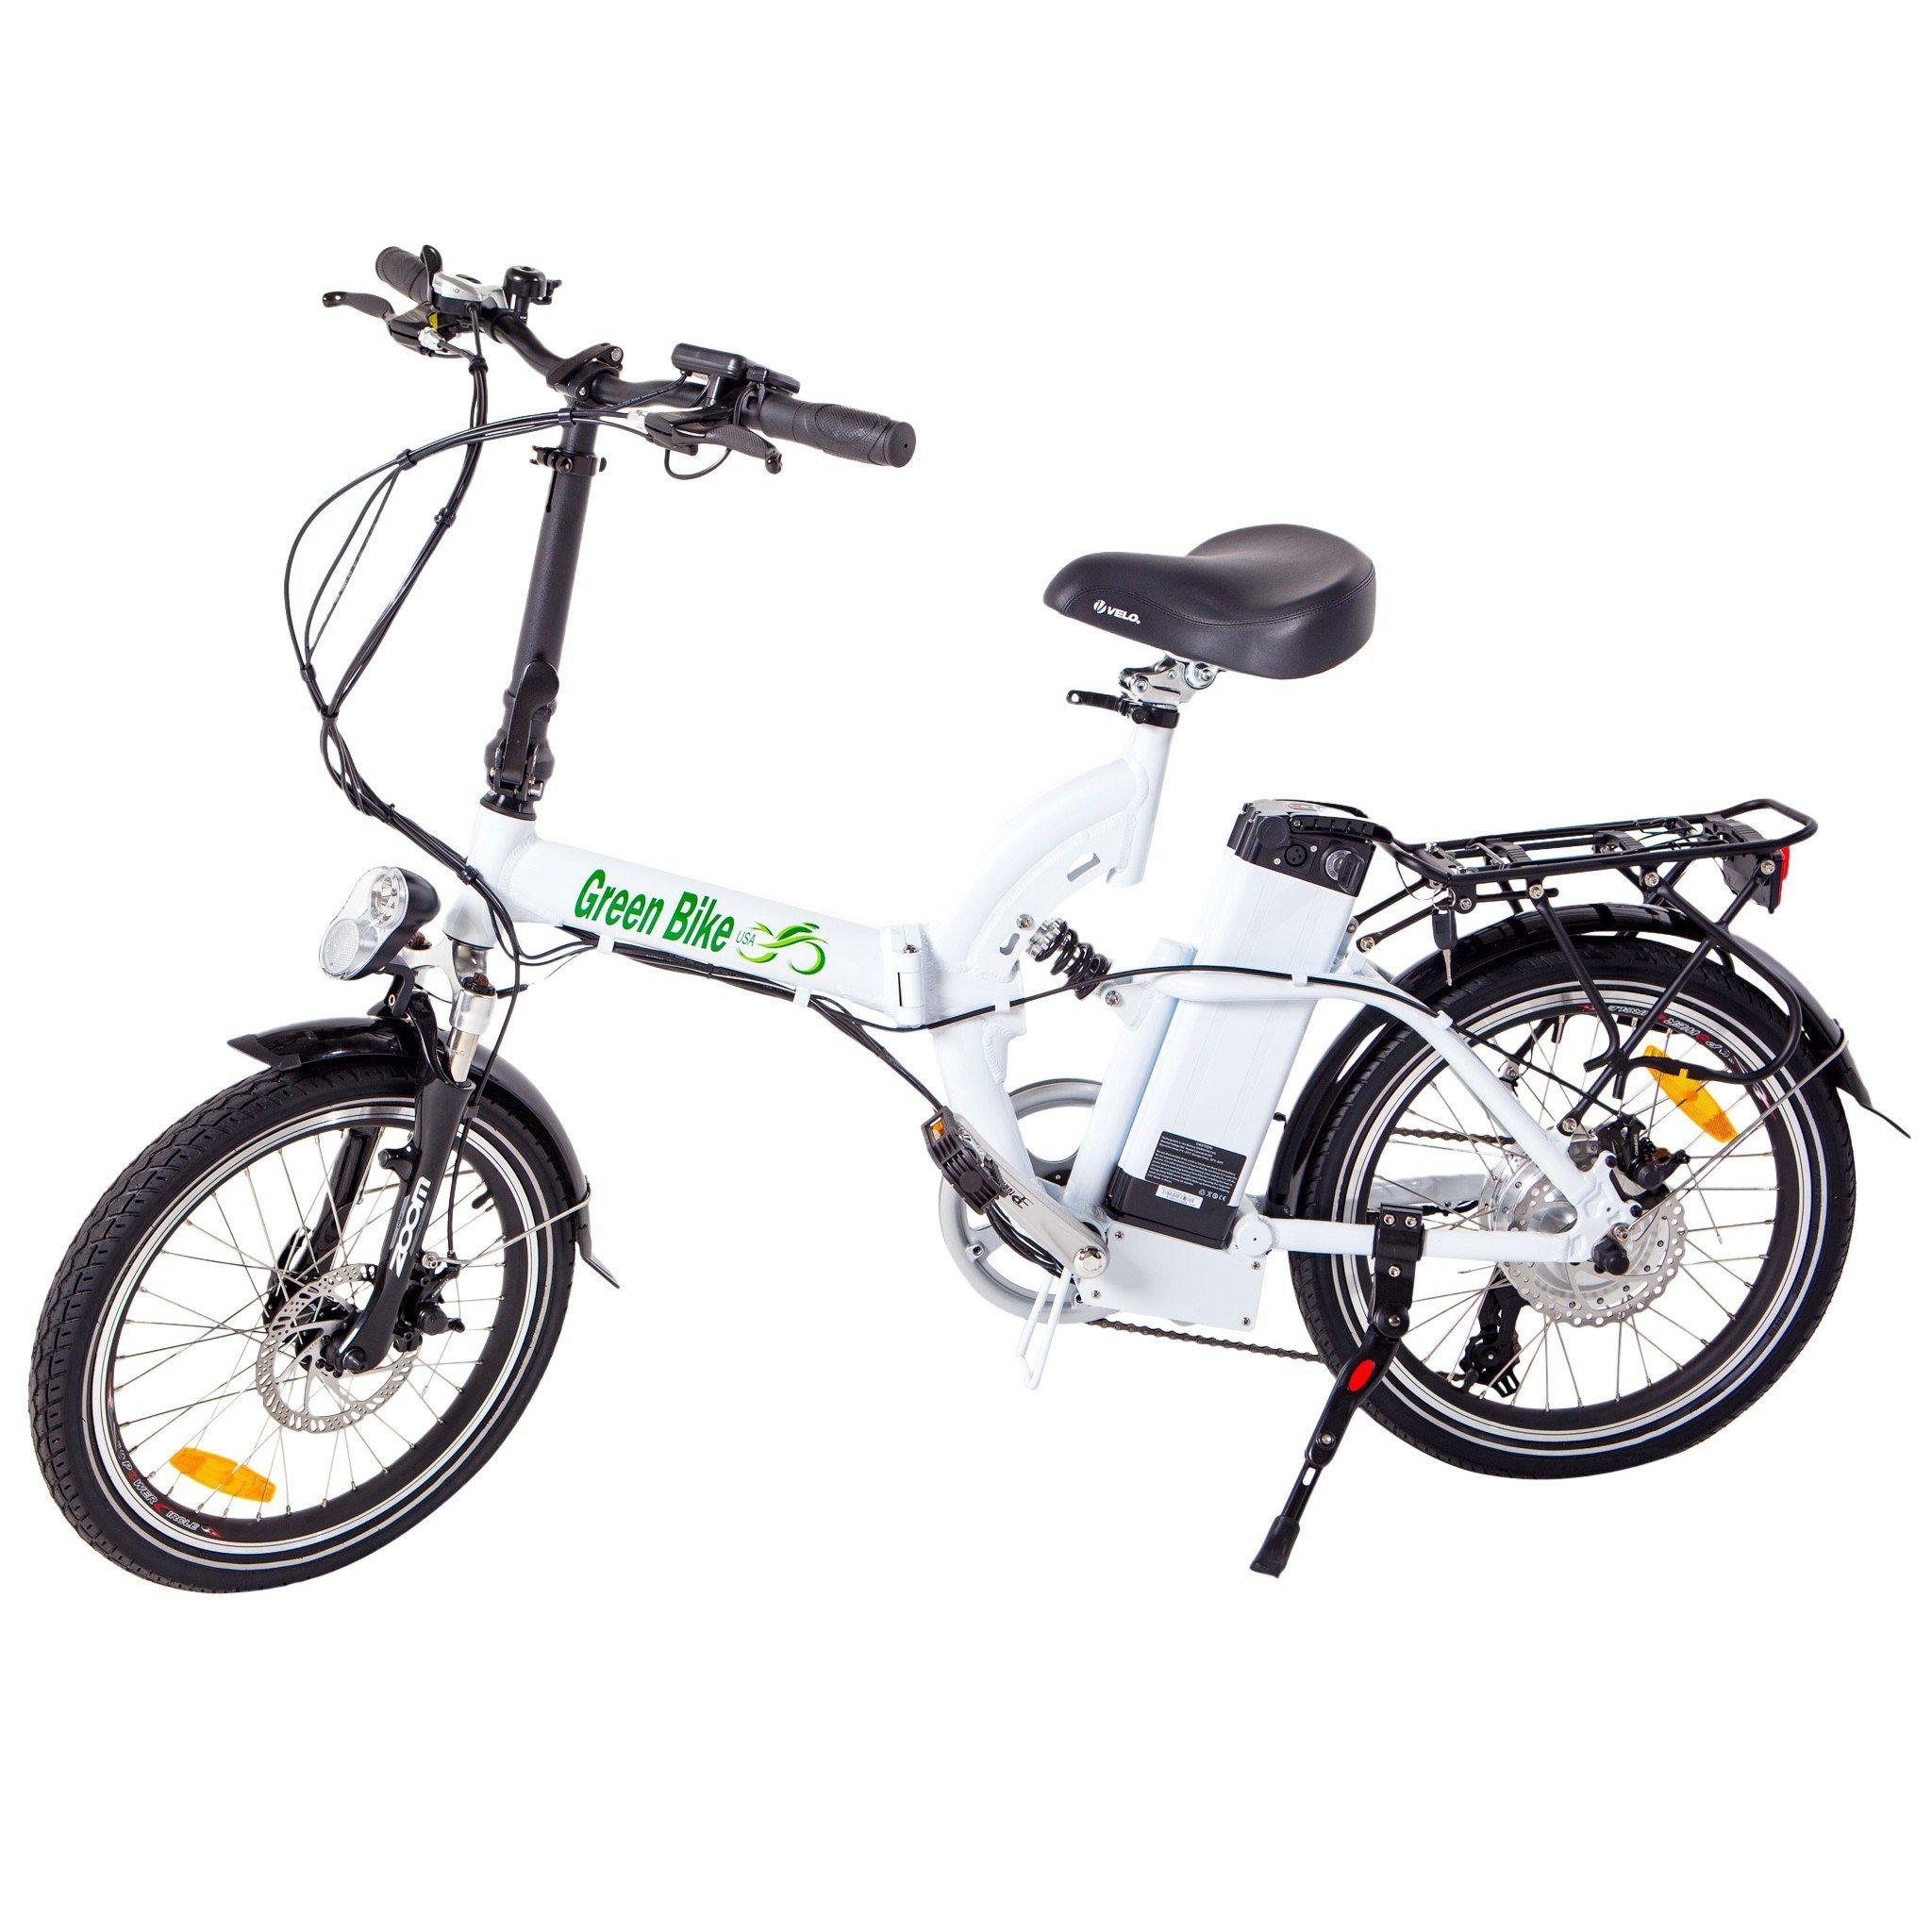 Green Bike Usa Gb500 48v 500w Cruiser Folding Electric